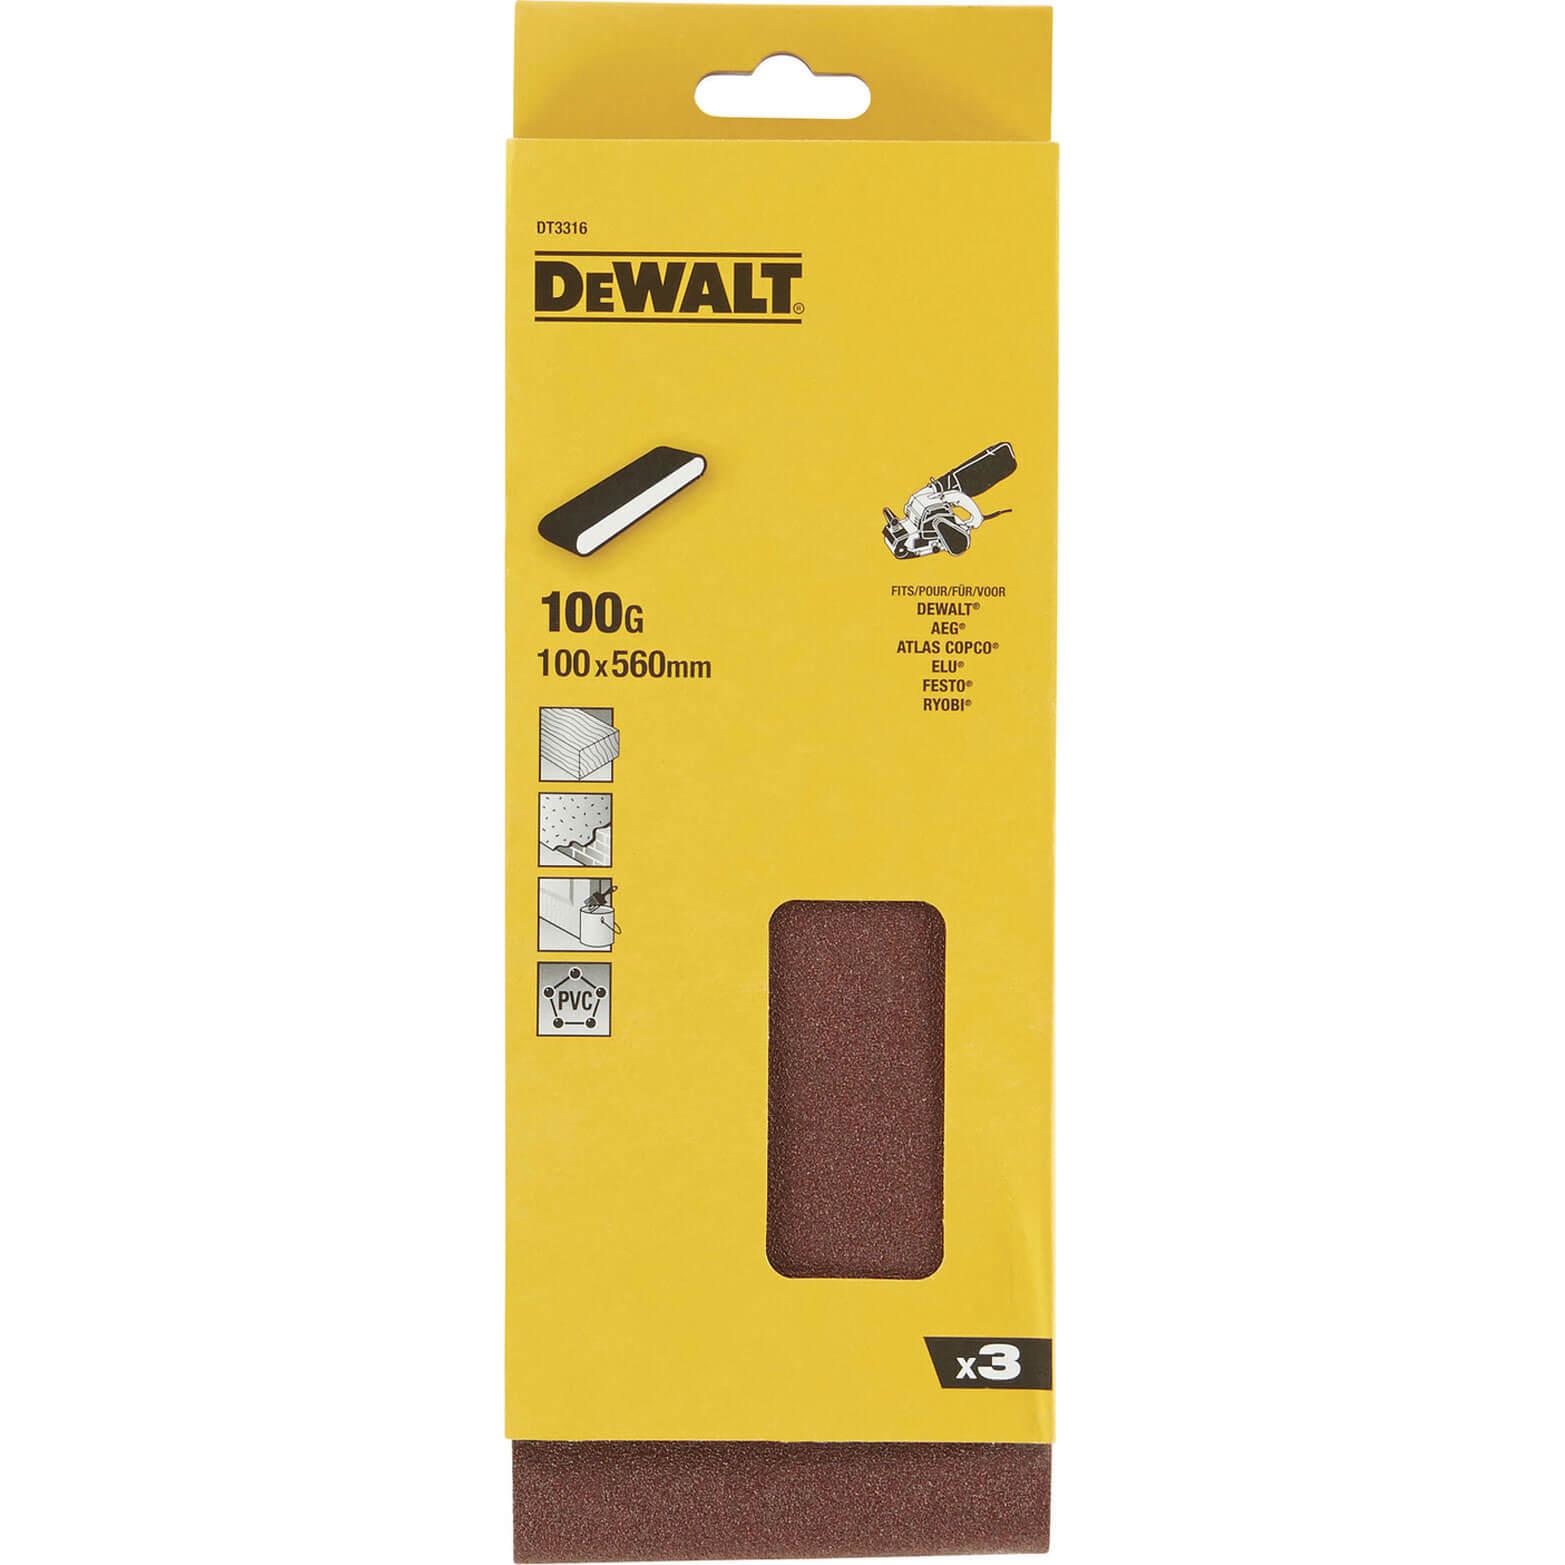 Image of DeWalt 100 x 560mm Multi Purpose Sanding Belts 100mm x 560mm 100g Pack of 3